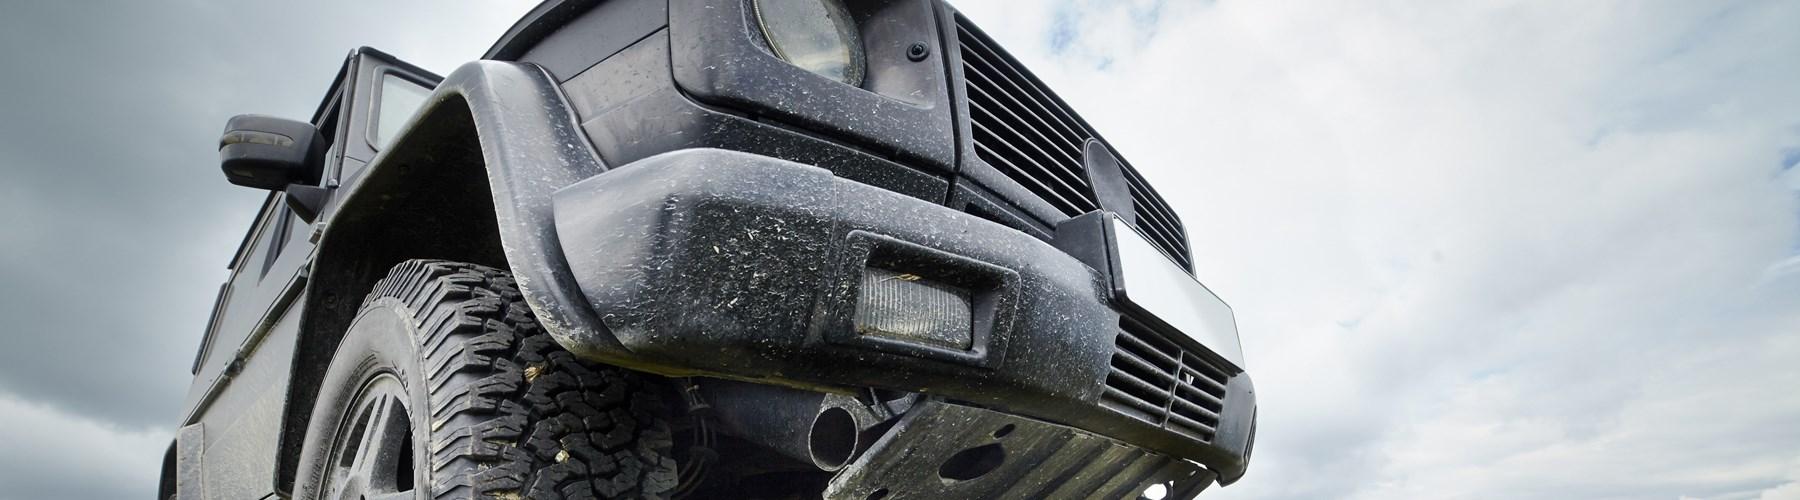 Close up image of black 4x4 car